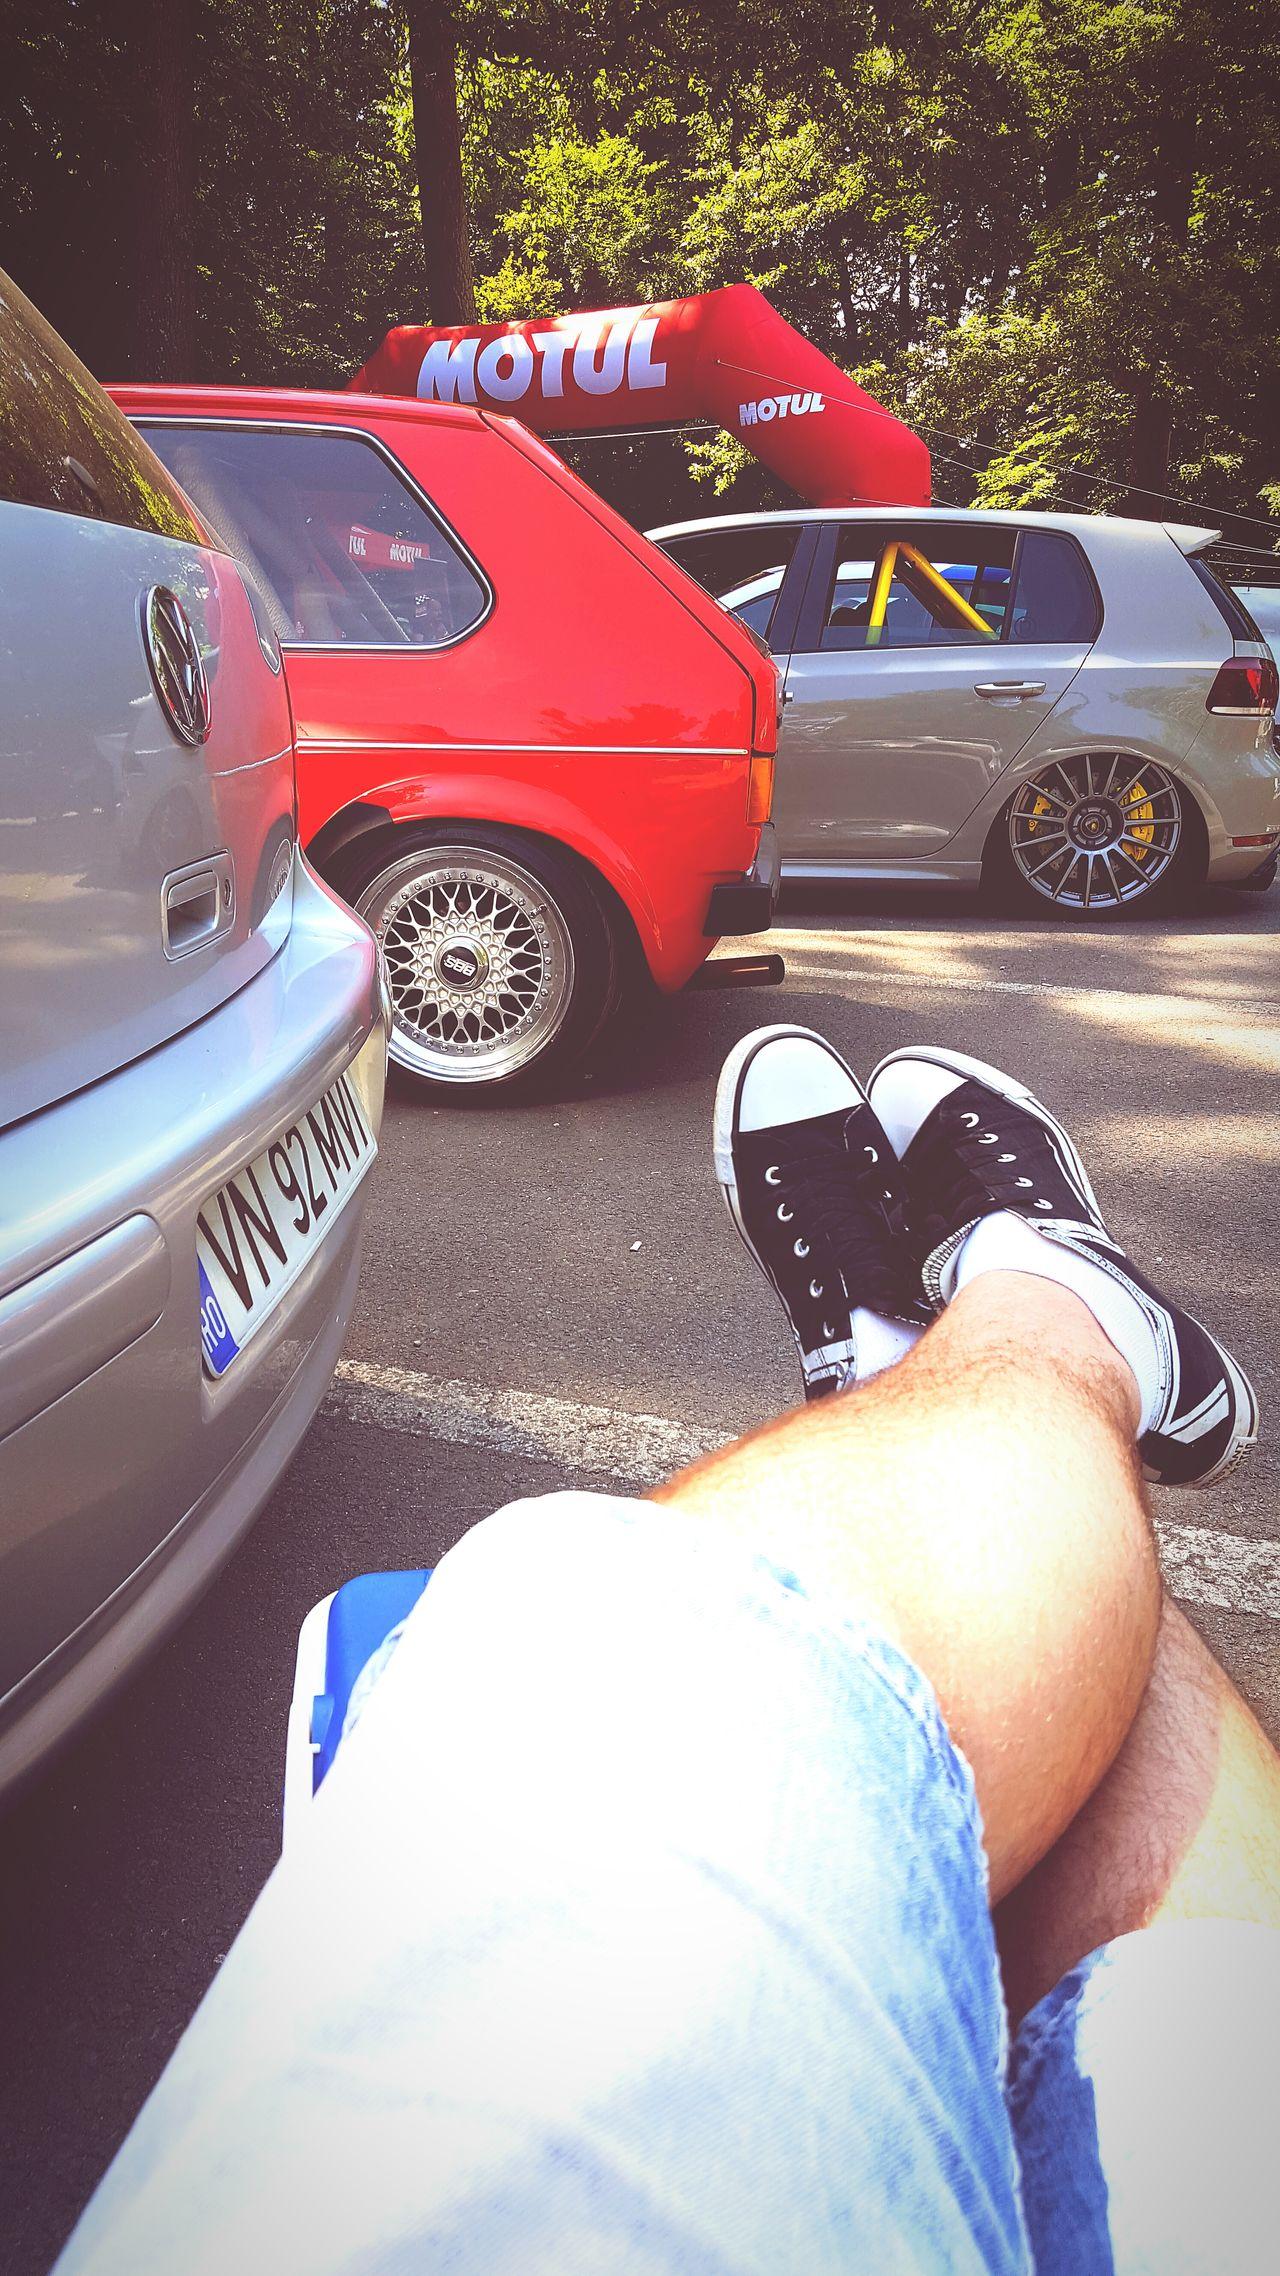 VW Golf Mk4 Mk1 Golf Mk6 Gti Gti ♥ Motul Fun Streetmaniacs Chill Mode Clasic